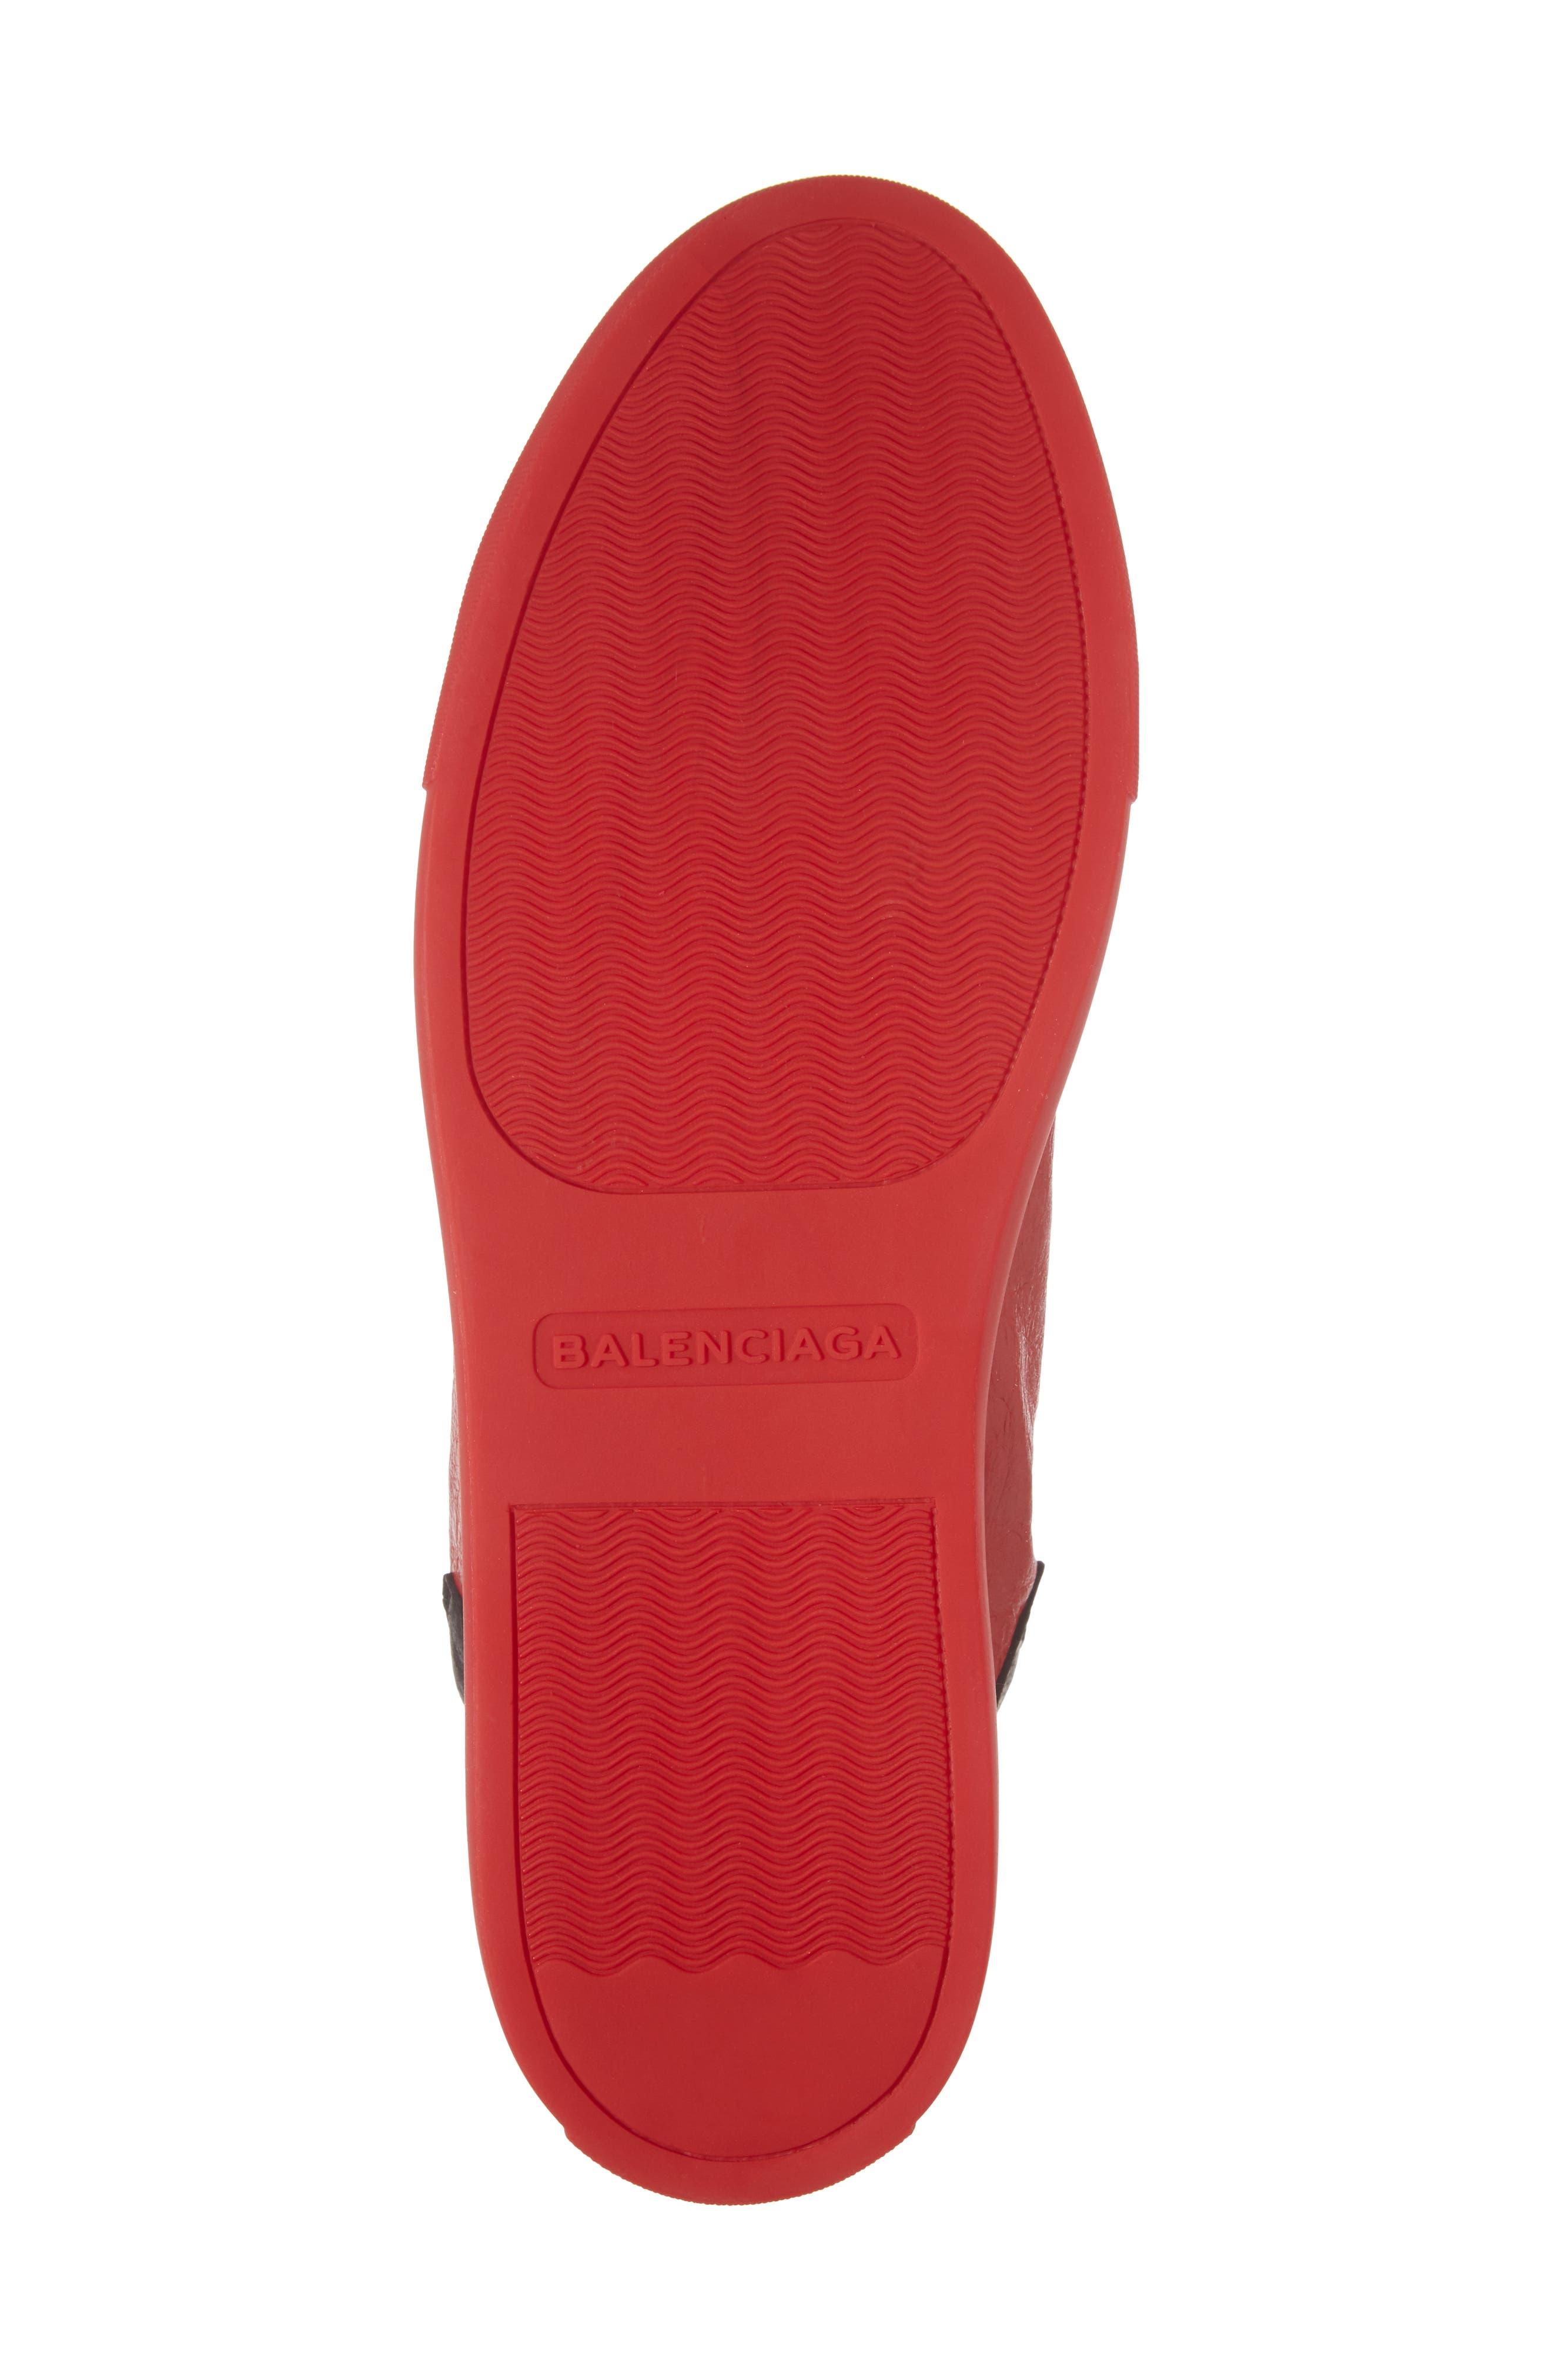 Arena High Sneaker,                             Alternate thumbnail 6, color,                             Rouge Paprika/ Noir Leather